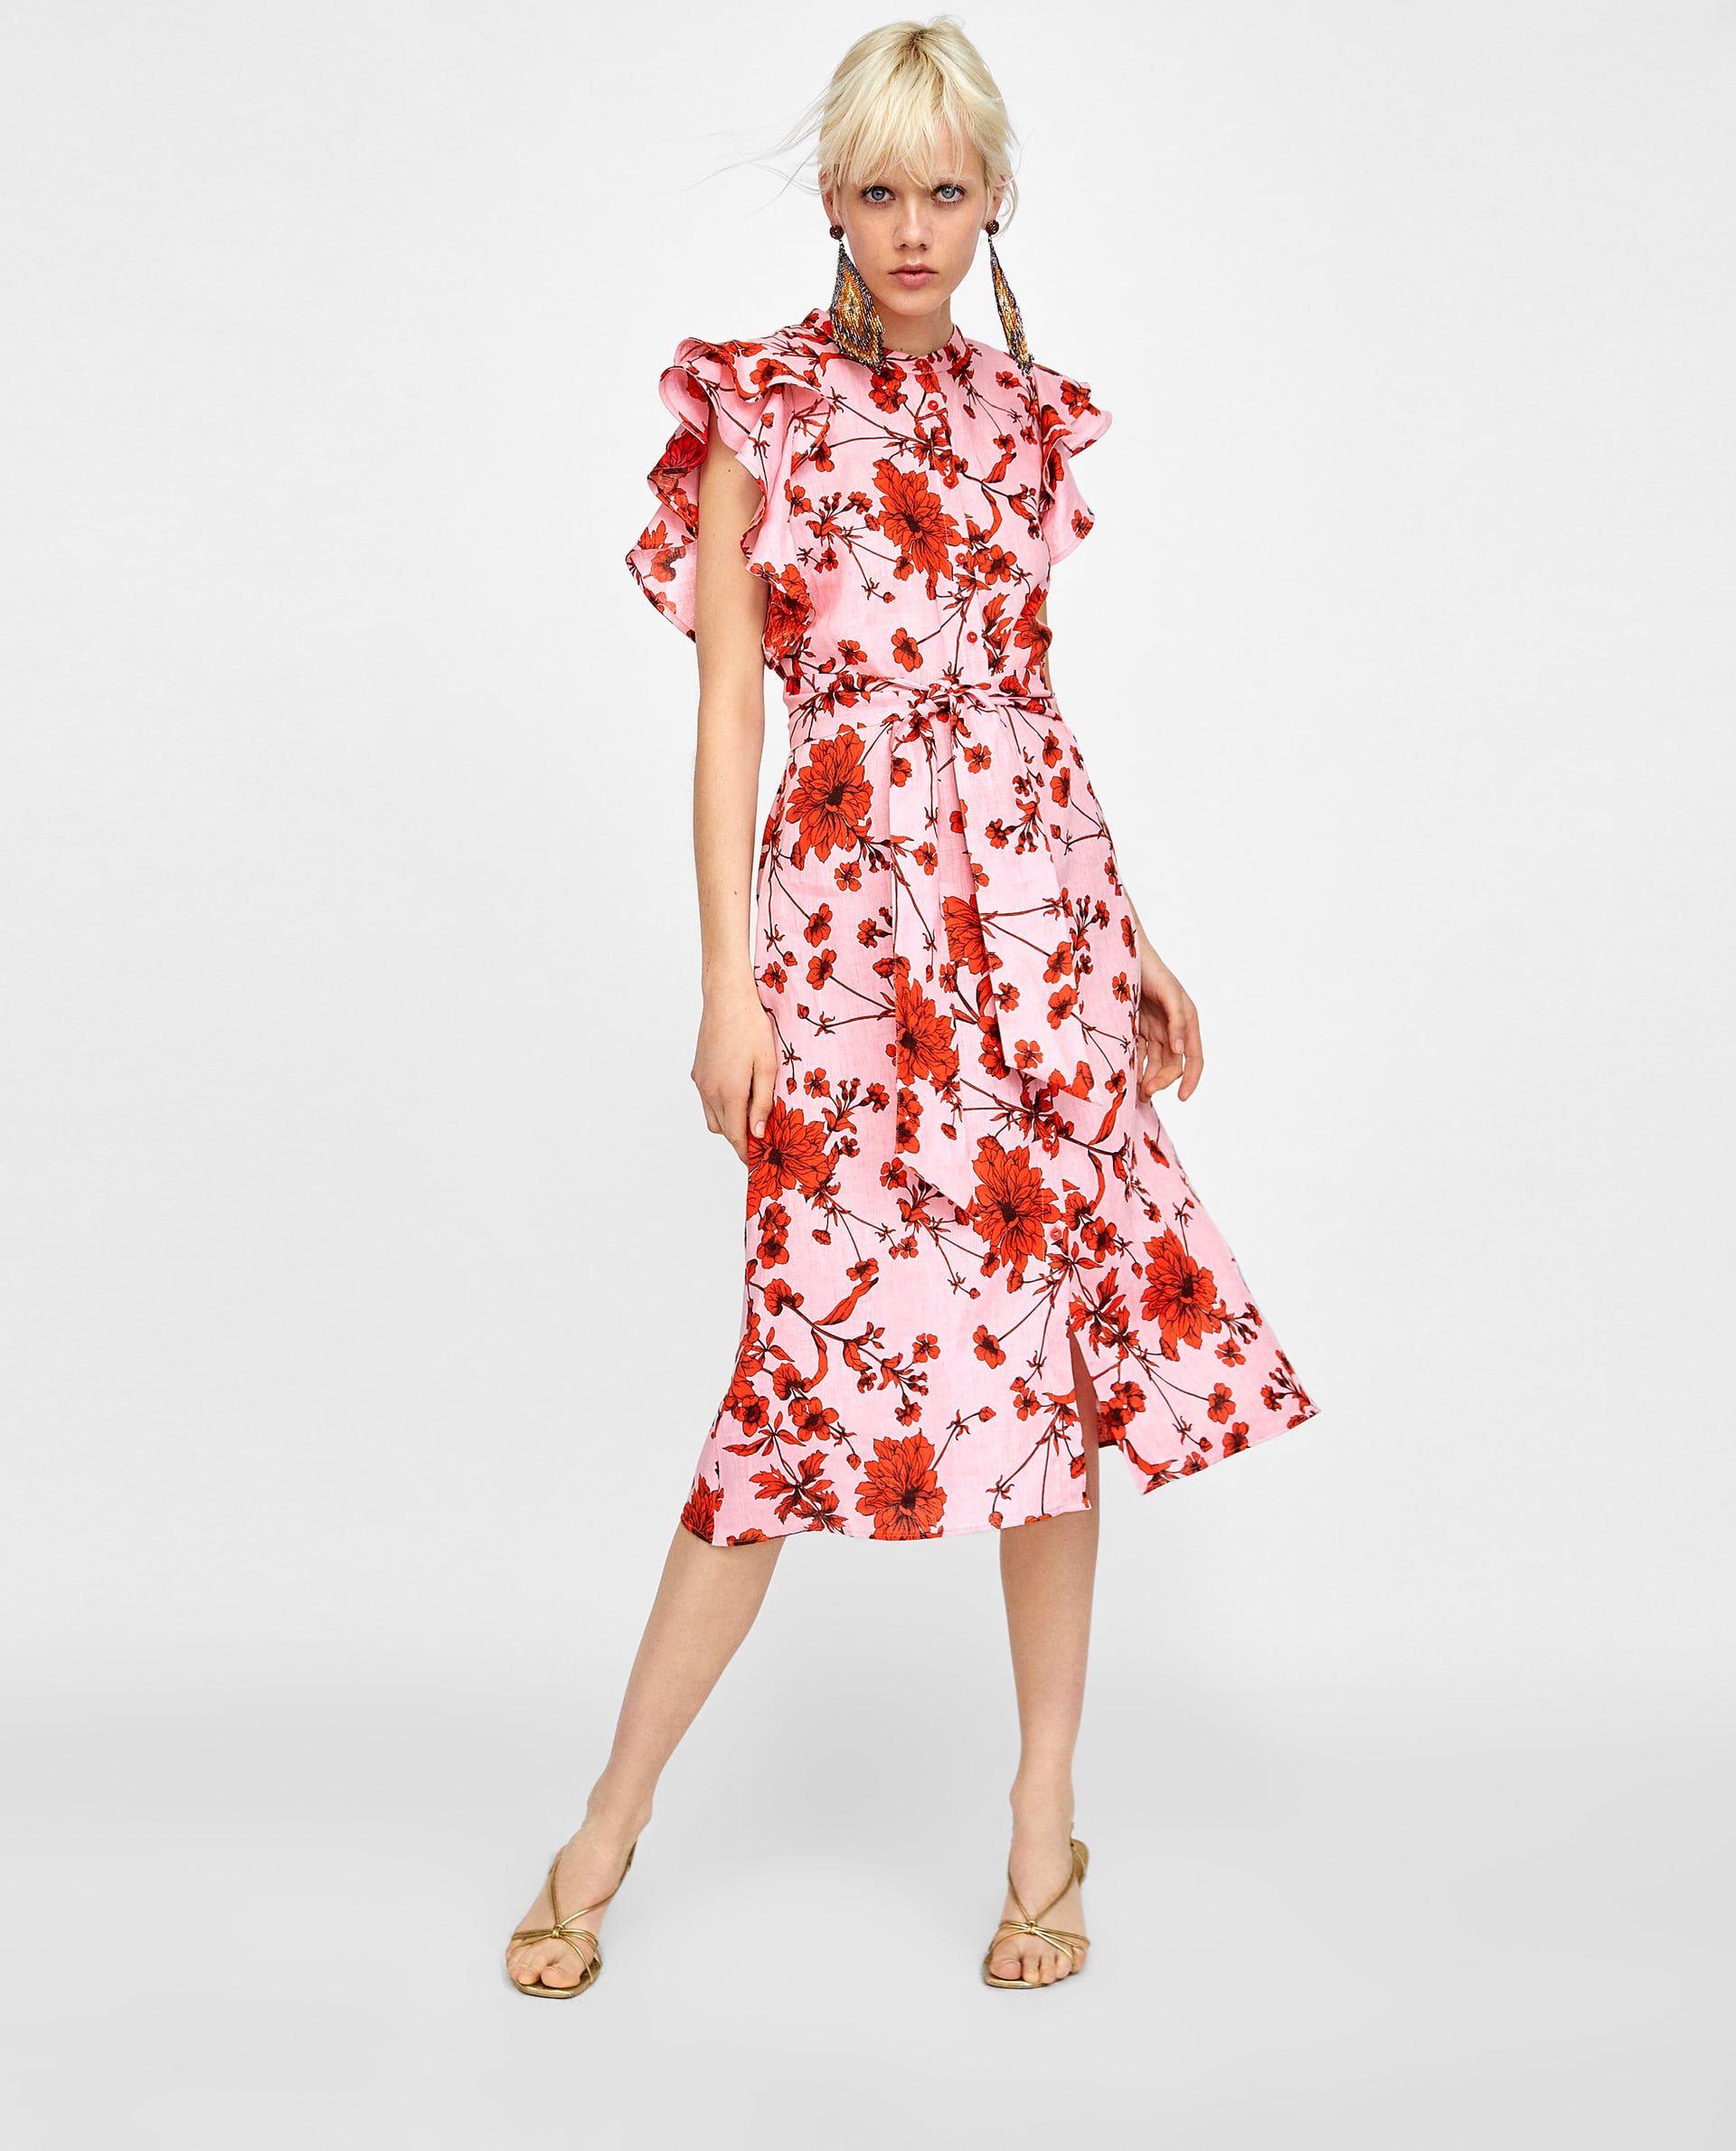 Lino Estampado In Túnica Dress 2019Red Floral Yf6vbI7yg